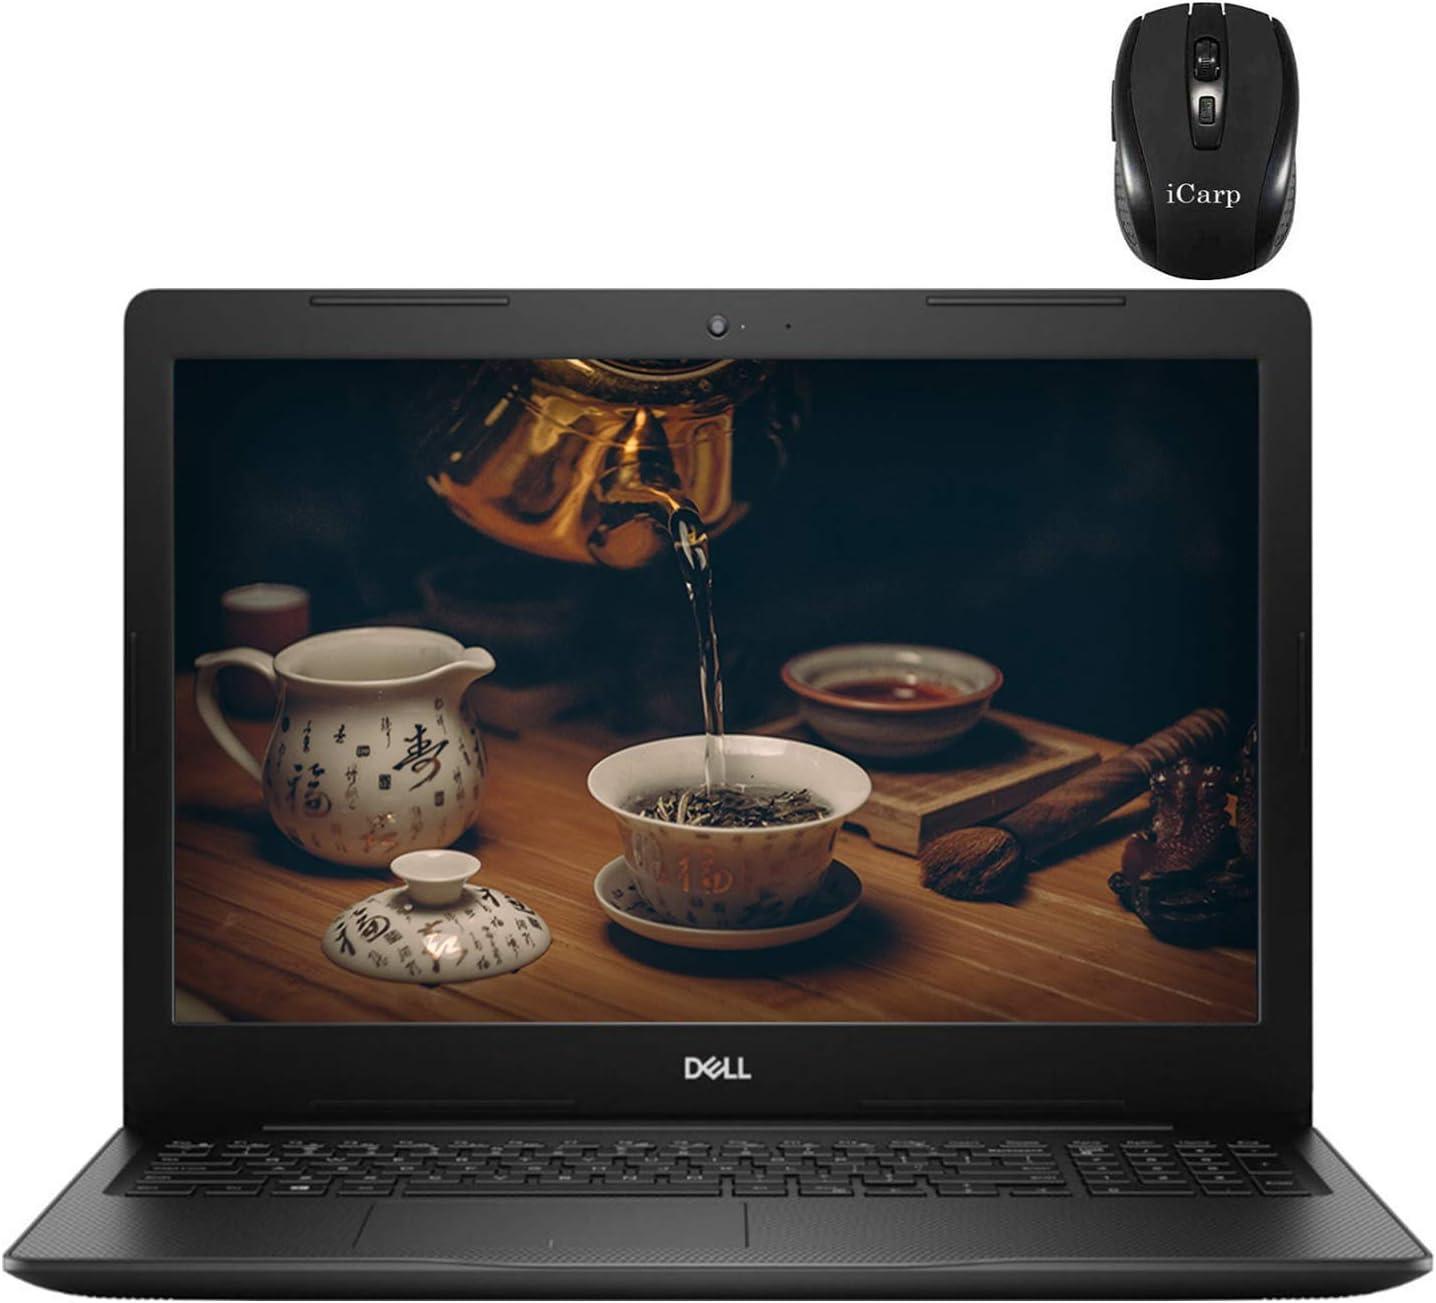 "Dell Inspiron 15 3000 2020 Flagship Laptop 15.6"" HD Anti-Glare Display 10th Gen Intel Core i3-1005G1 (> i5-7200U) 8GB DDR4 128GB SSD MaxxAudio Pro USB-C Win 10 + Delca 16GB Micro SD Card"